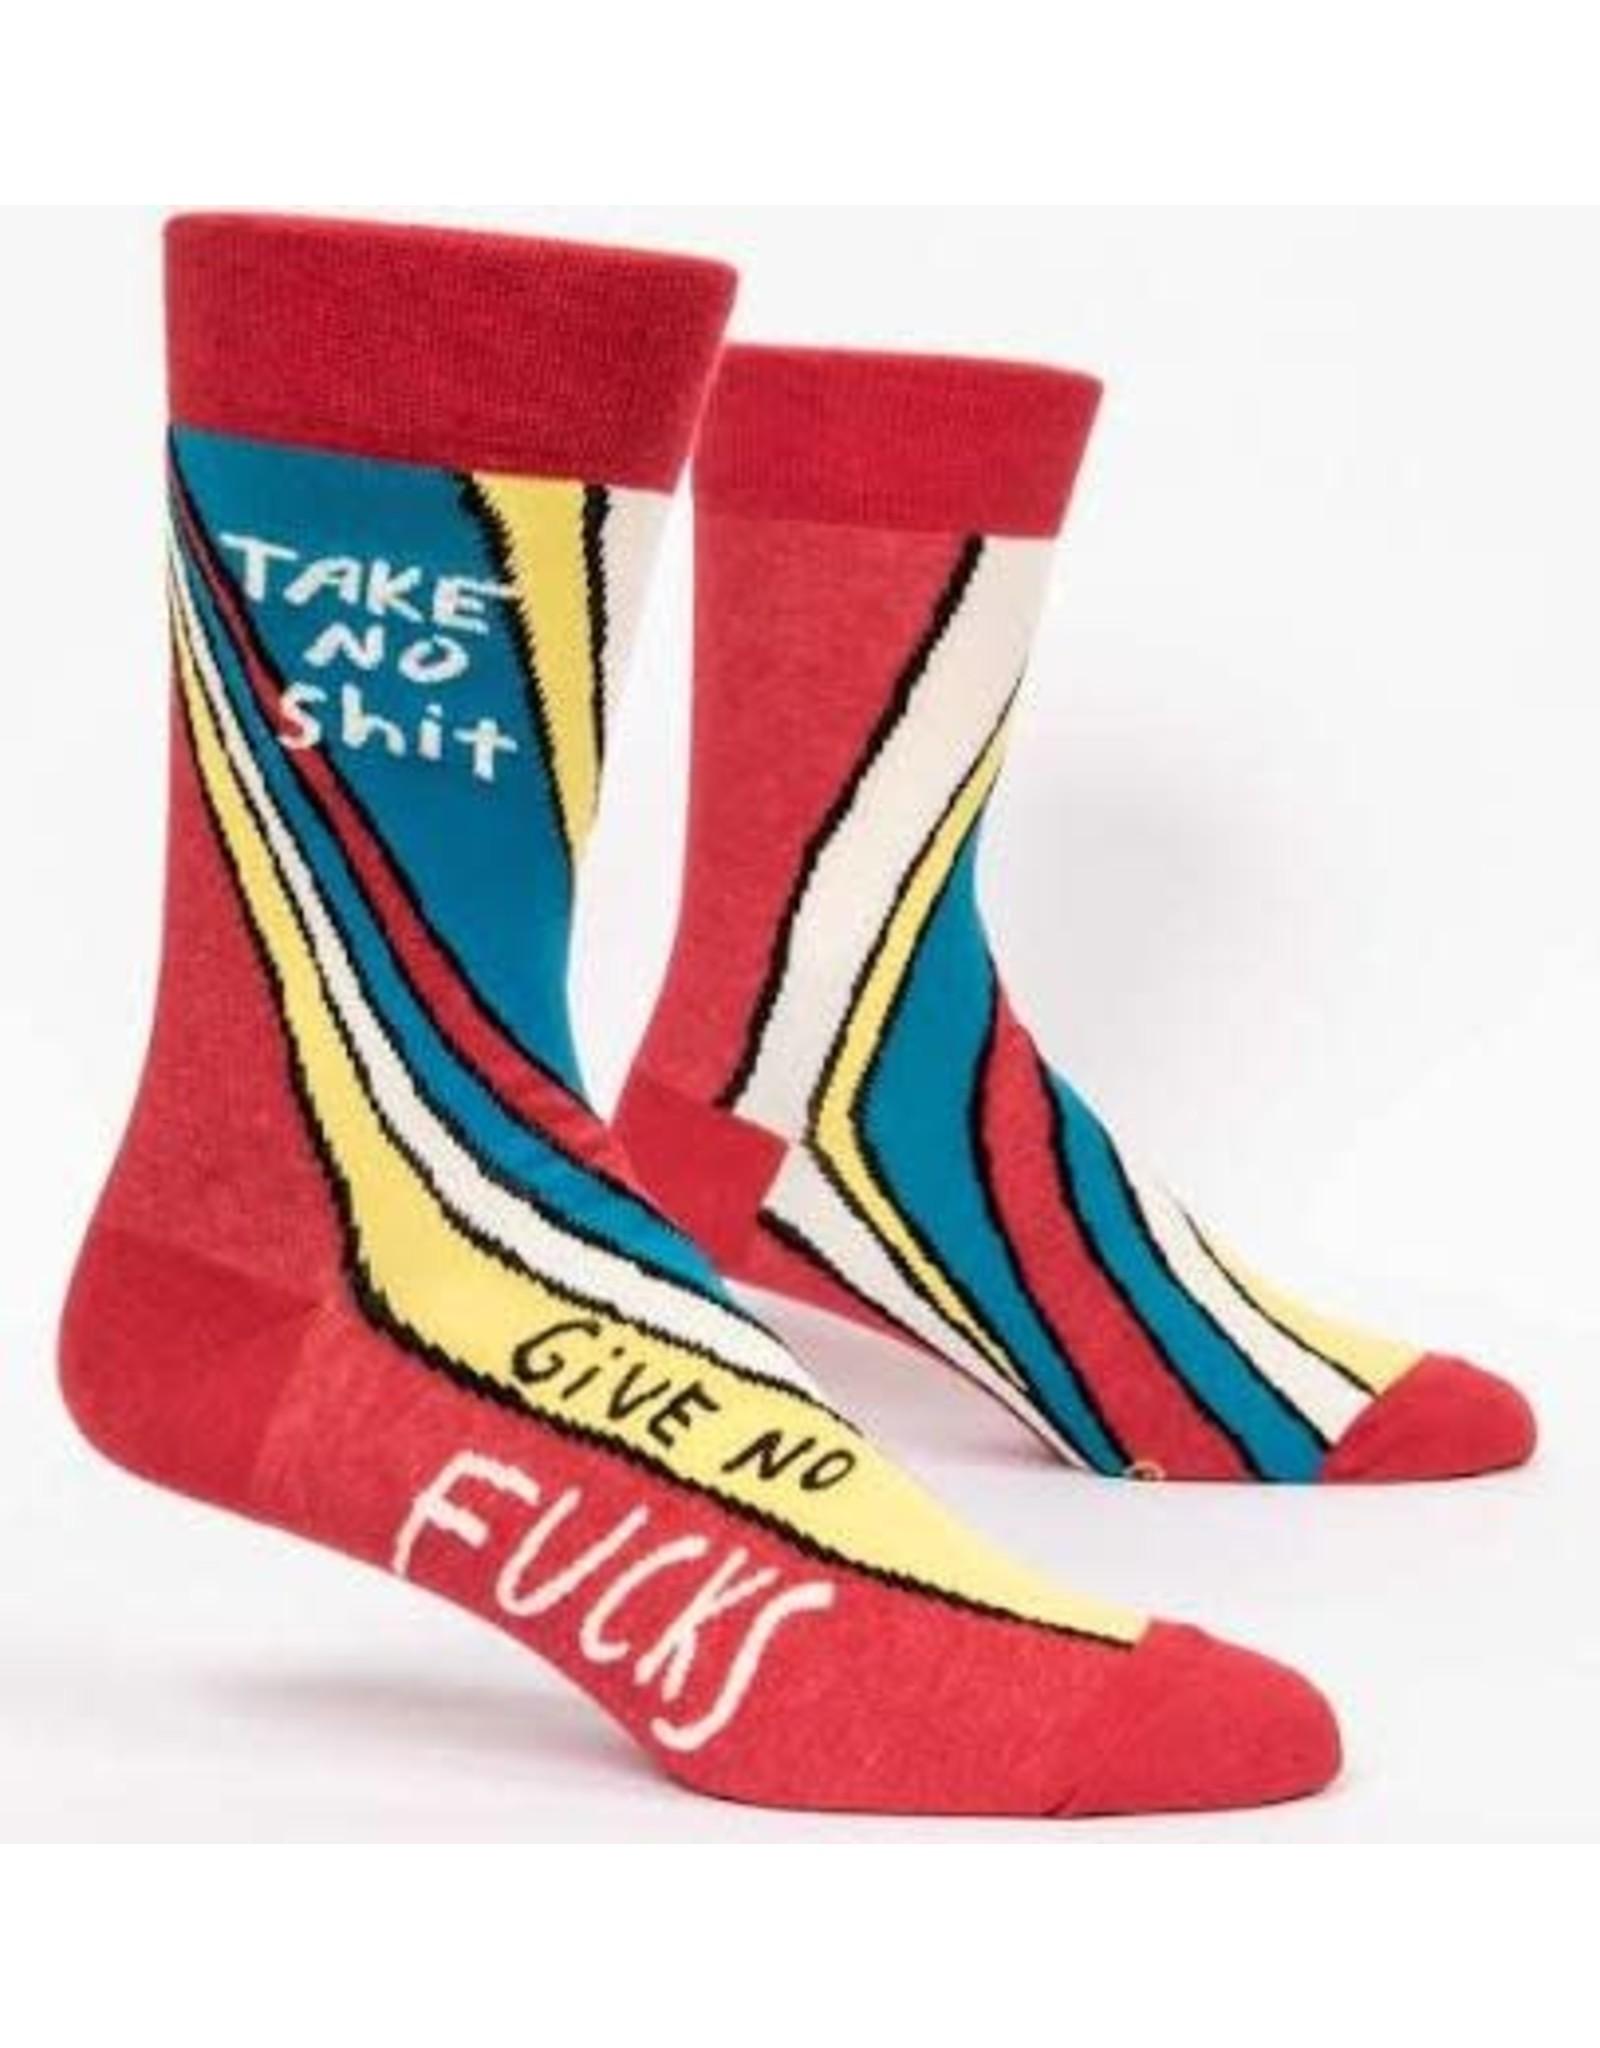 Socks (Mens)  - Take No Shit, Give No Fucks